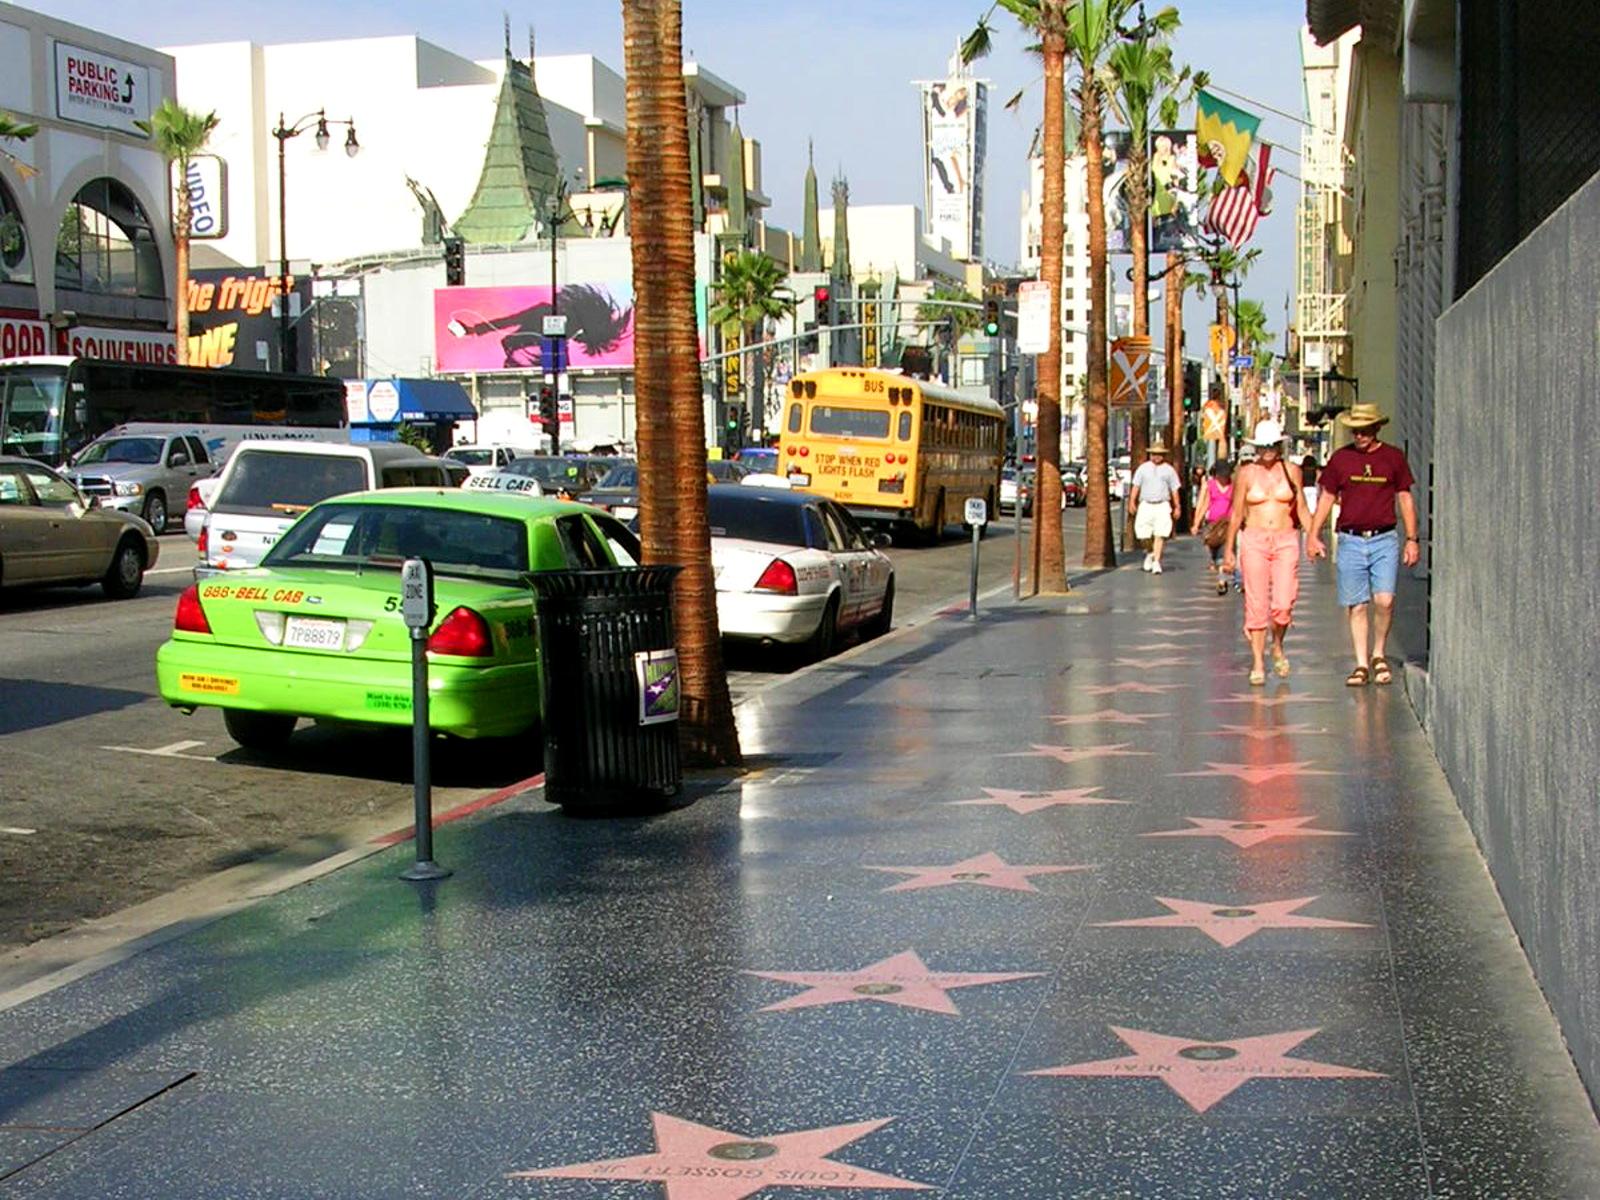 Le célèbre Walk of Fame d'Hollywood Boulevard,